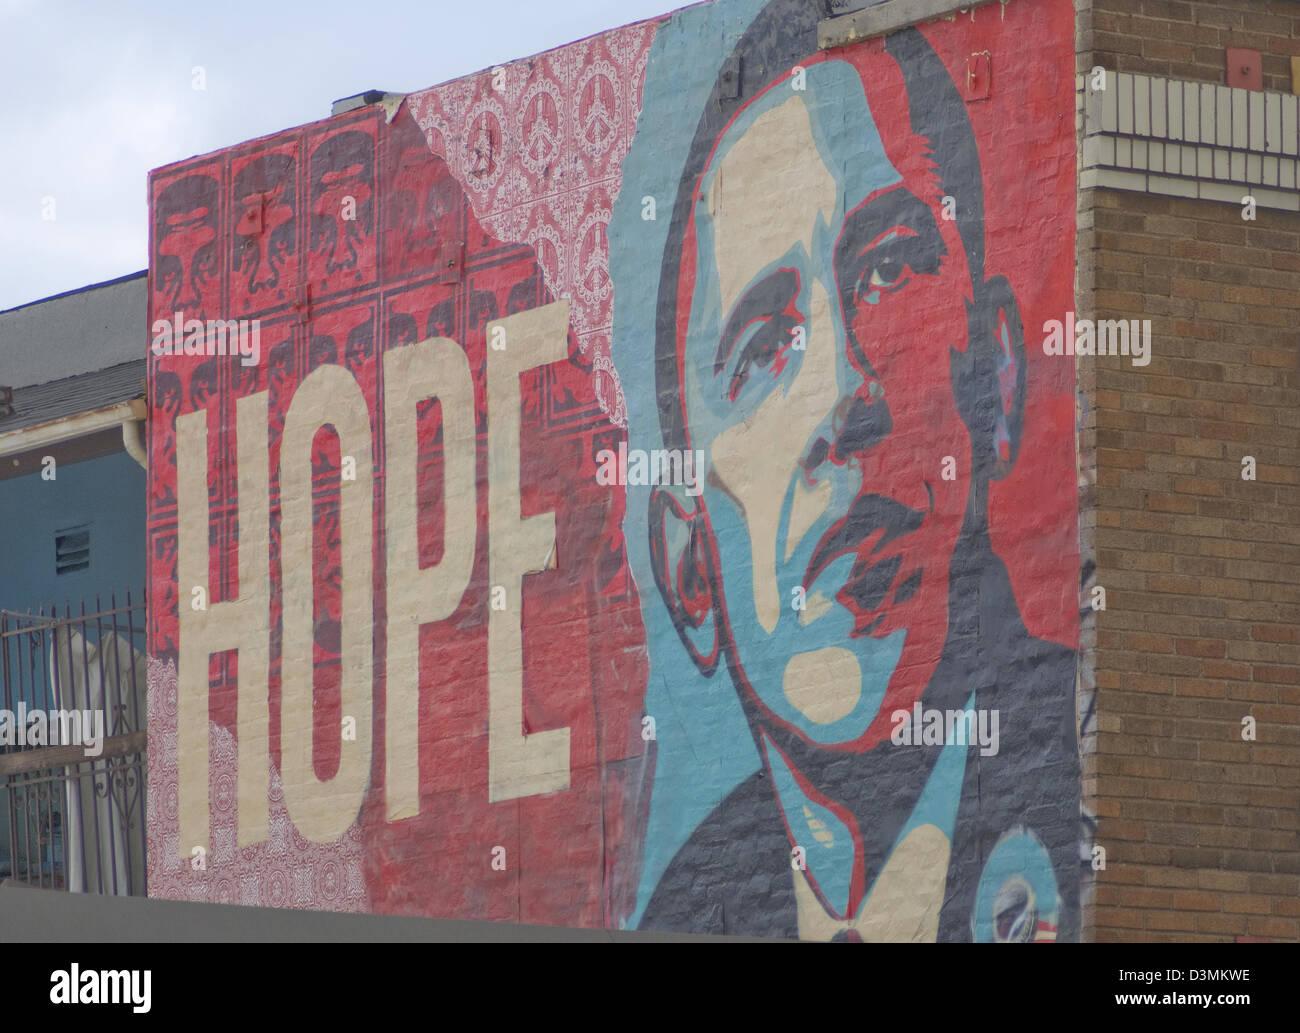 Hope And Change In Libya >> shepard fairey barack obama hope mural on hollywood boulevard in los Stock Photo: 53929722 - Alamy